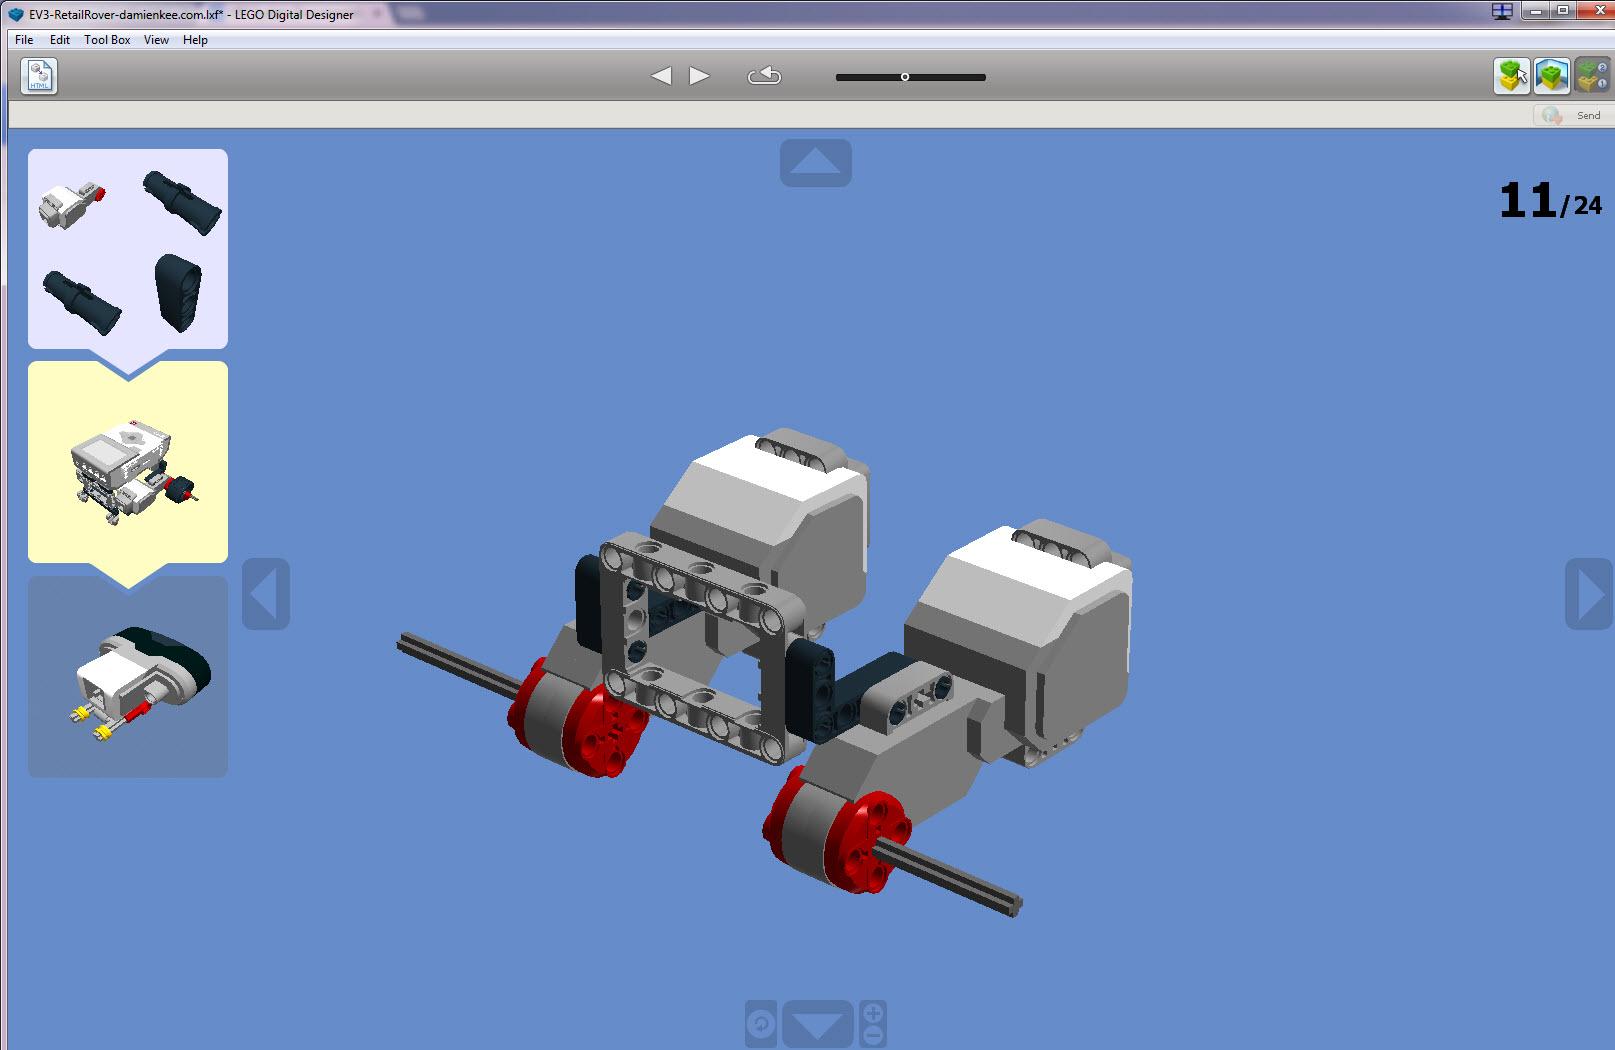 Introducing LEGO Digital Designer | Virtual Robotics Toolkit